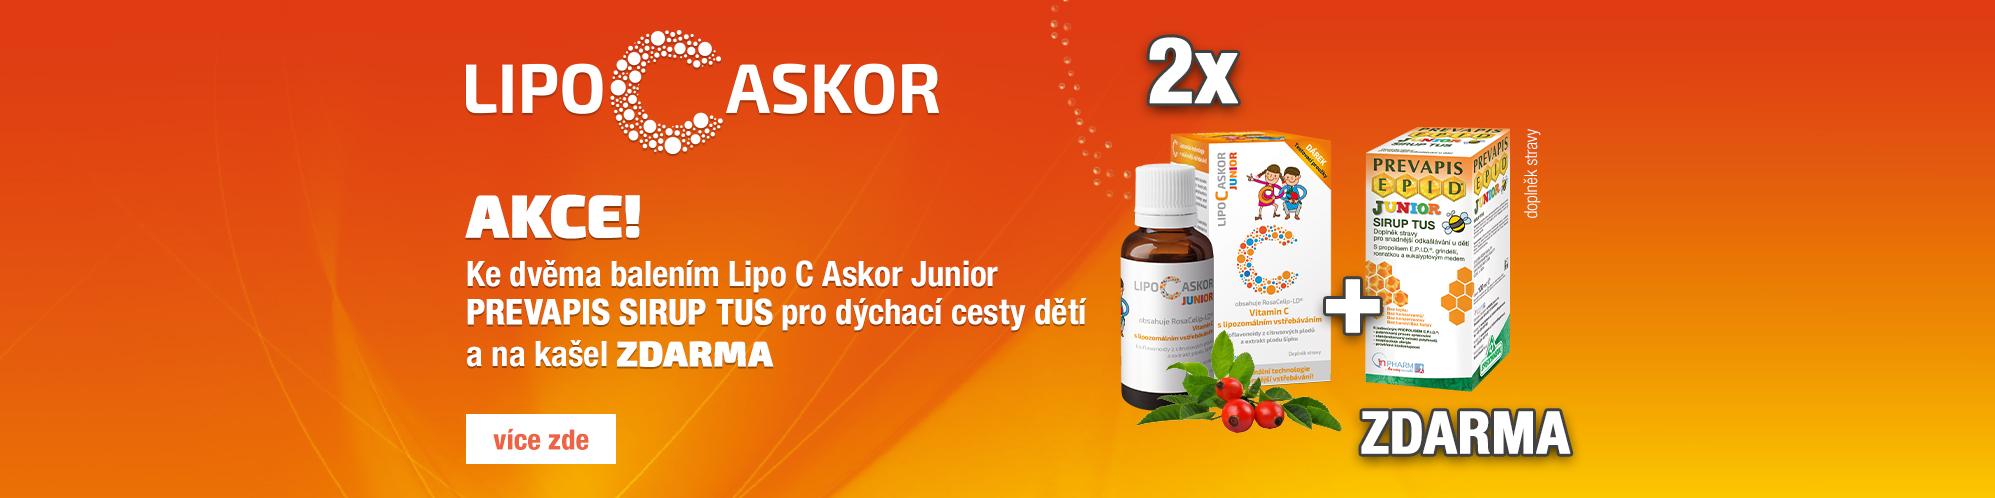 Balíček Lipo C Askor Junior + Prevapis junior Tus